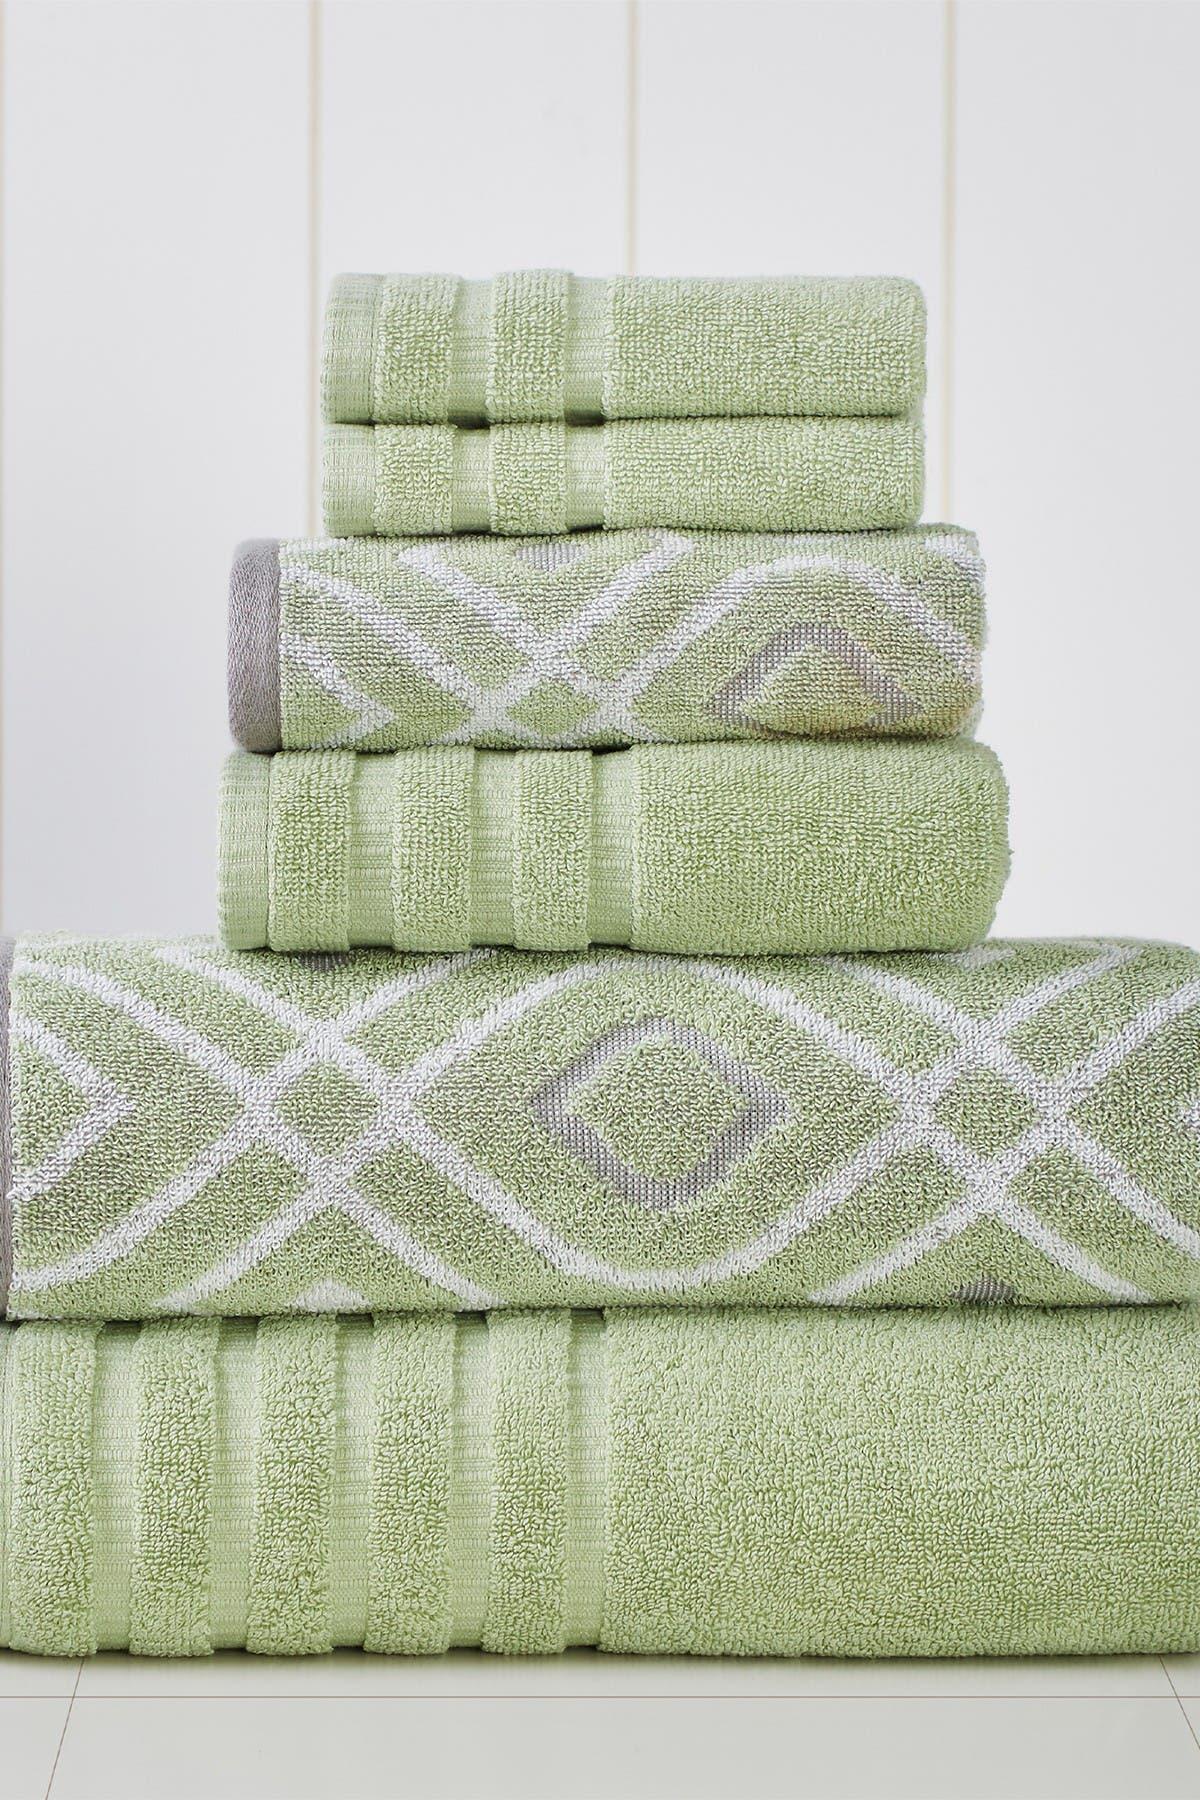 Image of Modern Threads Yard Dyed Towel 6-Piece Set - Oxford Sage Green